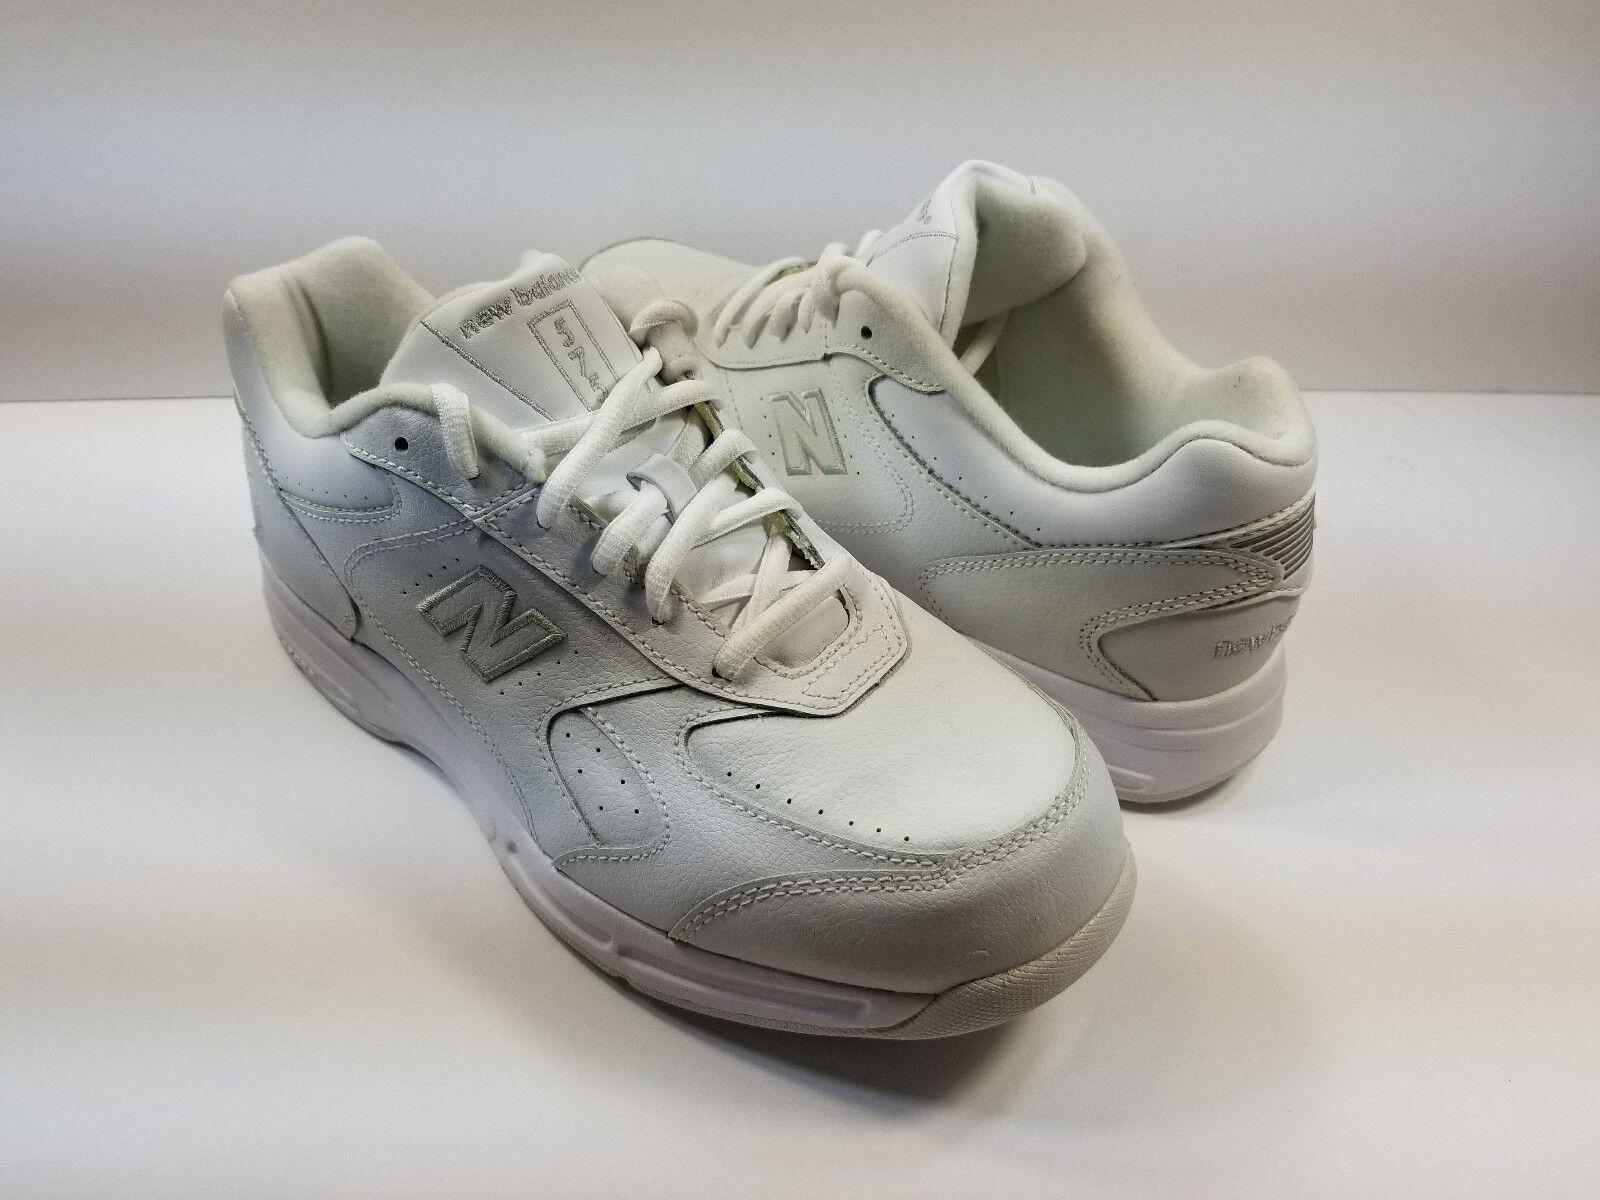 New Balance 575 AL-1 Health Walk Men's White Sneakers - Size 8 4E